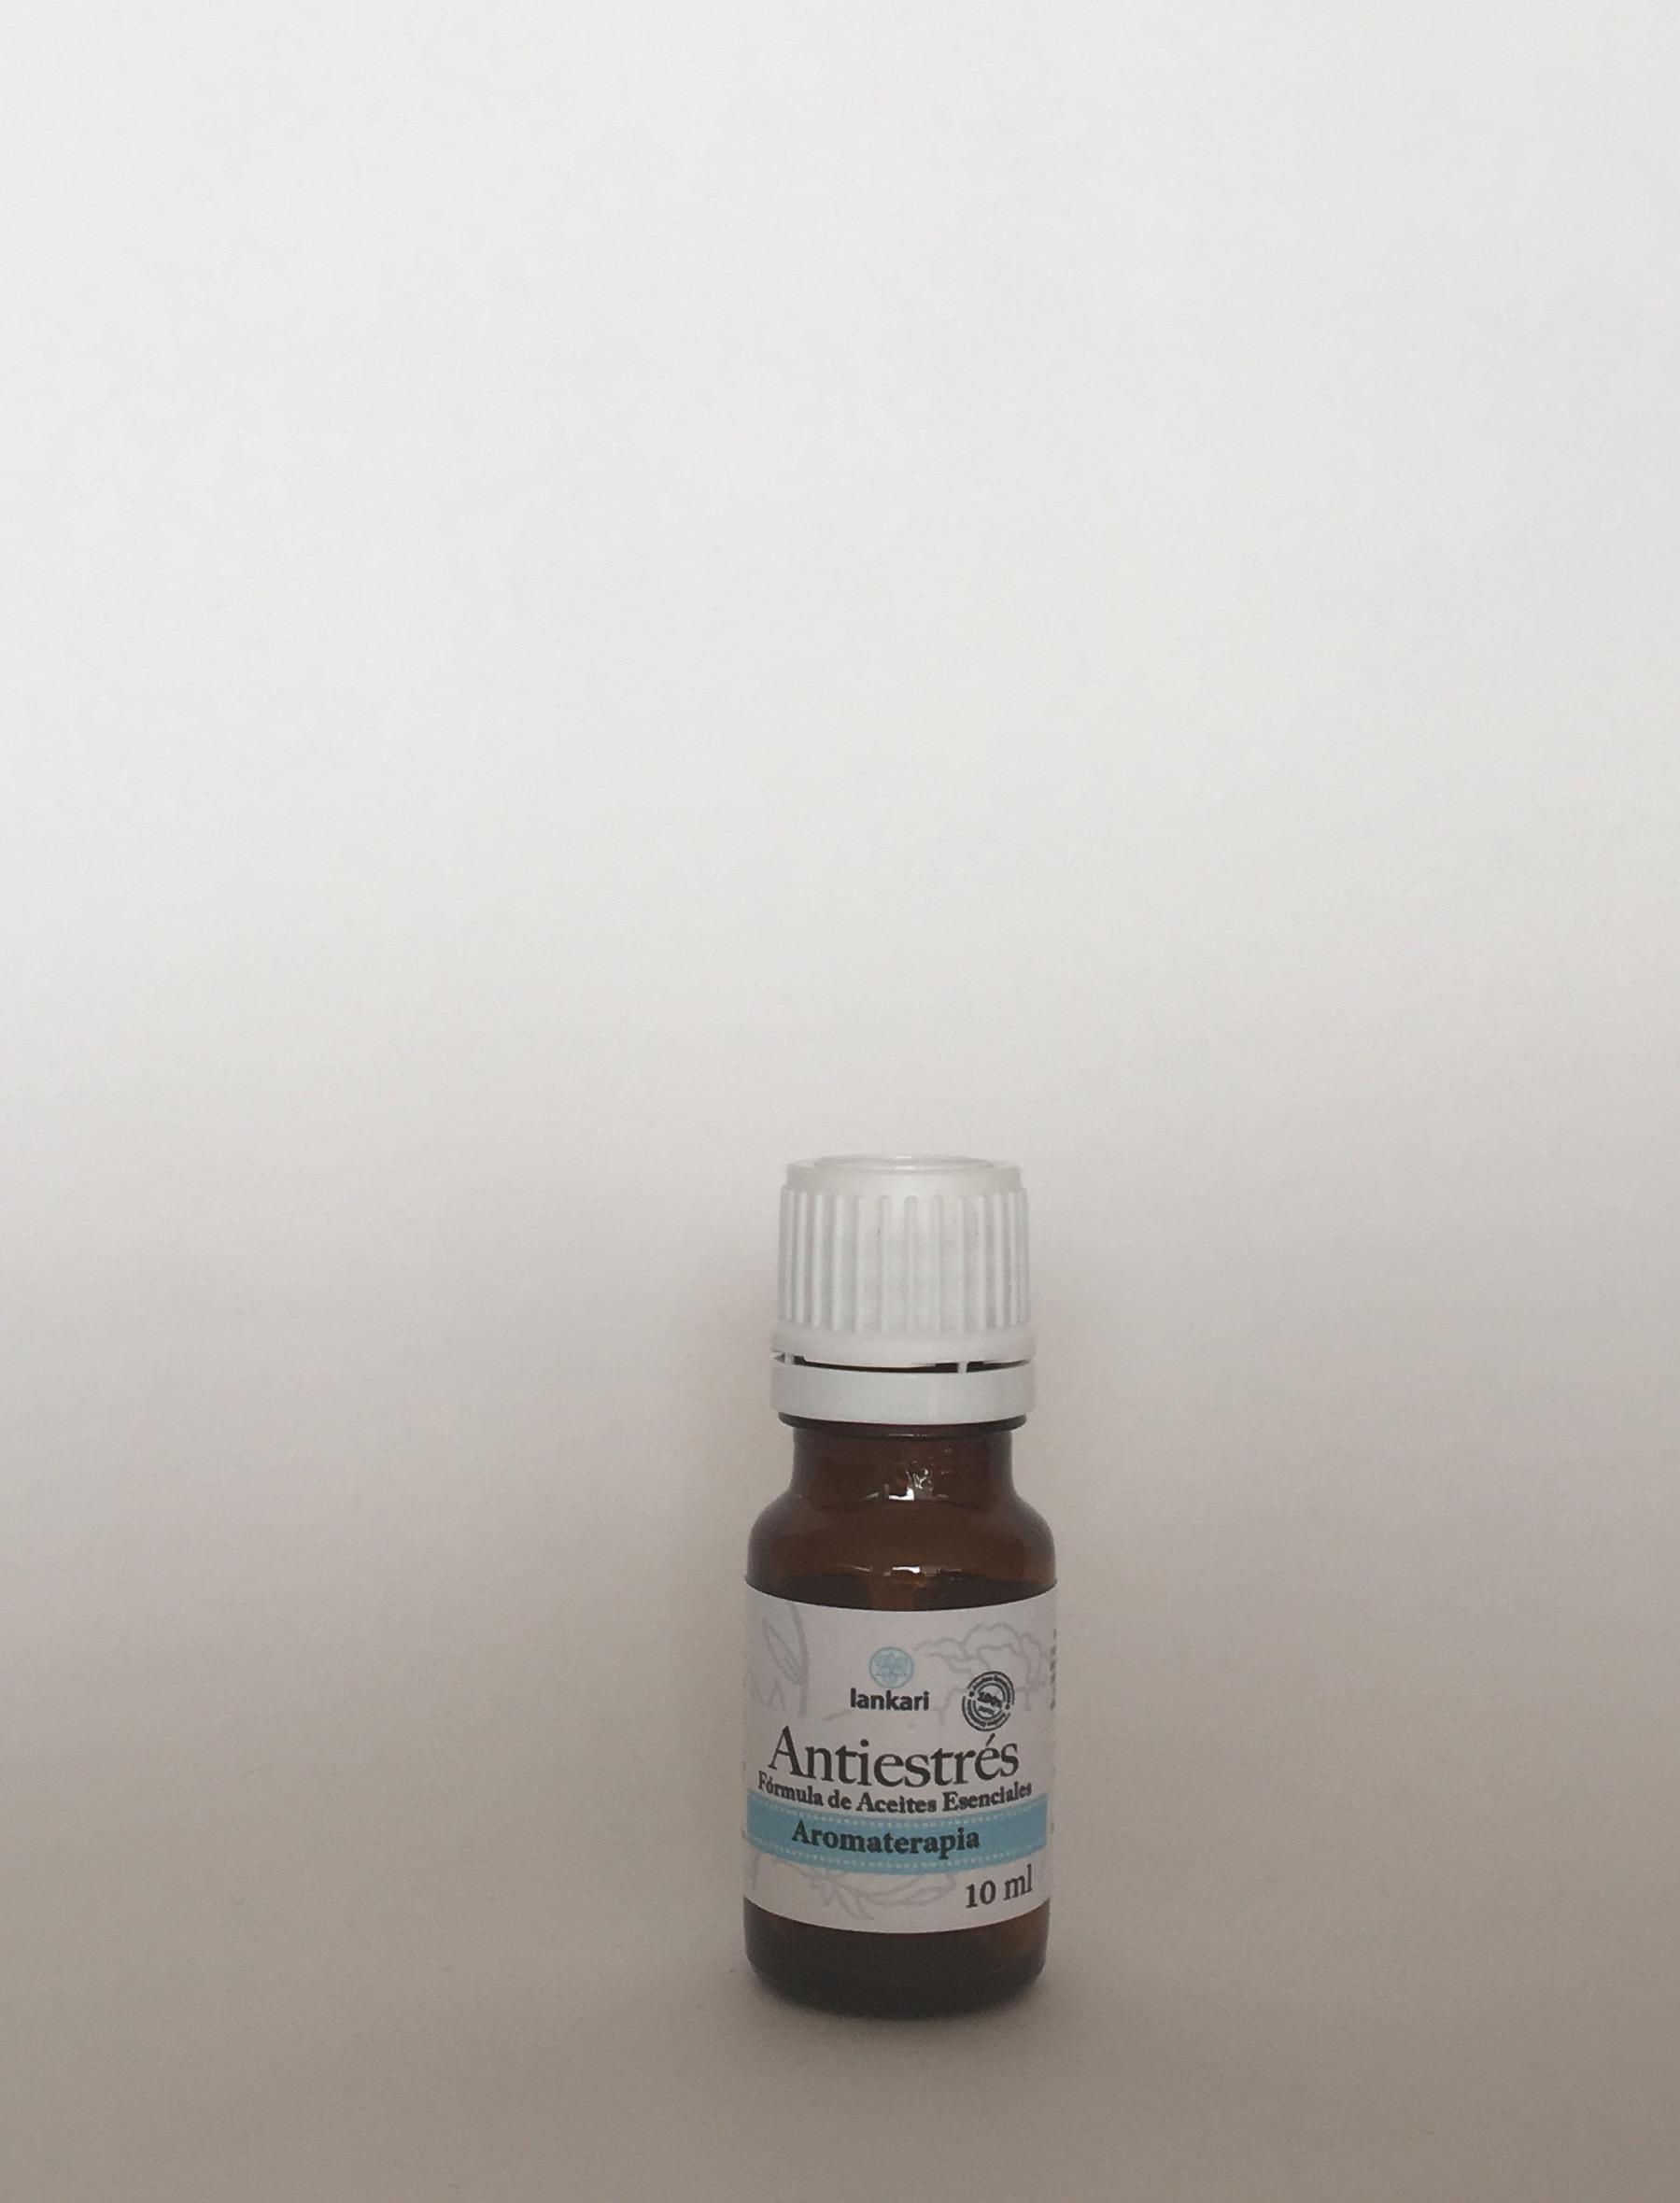 Aromaterapia Antiestrés Aceite Esencial